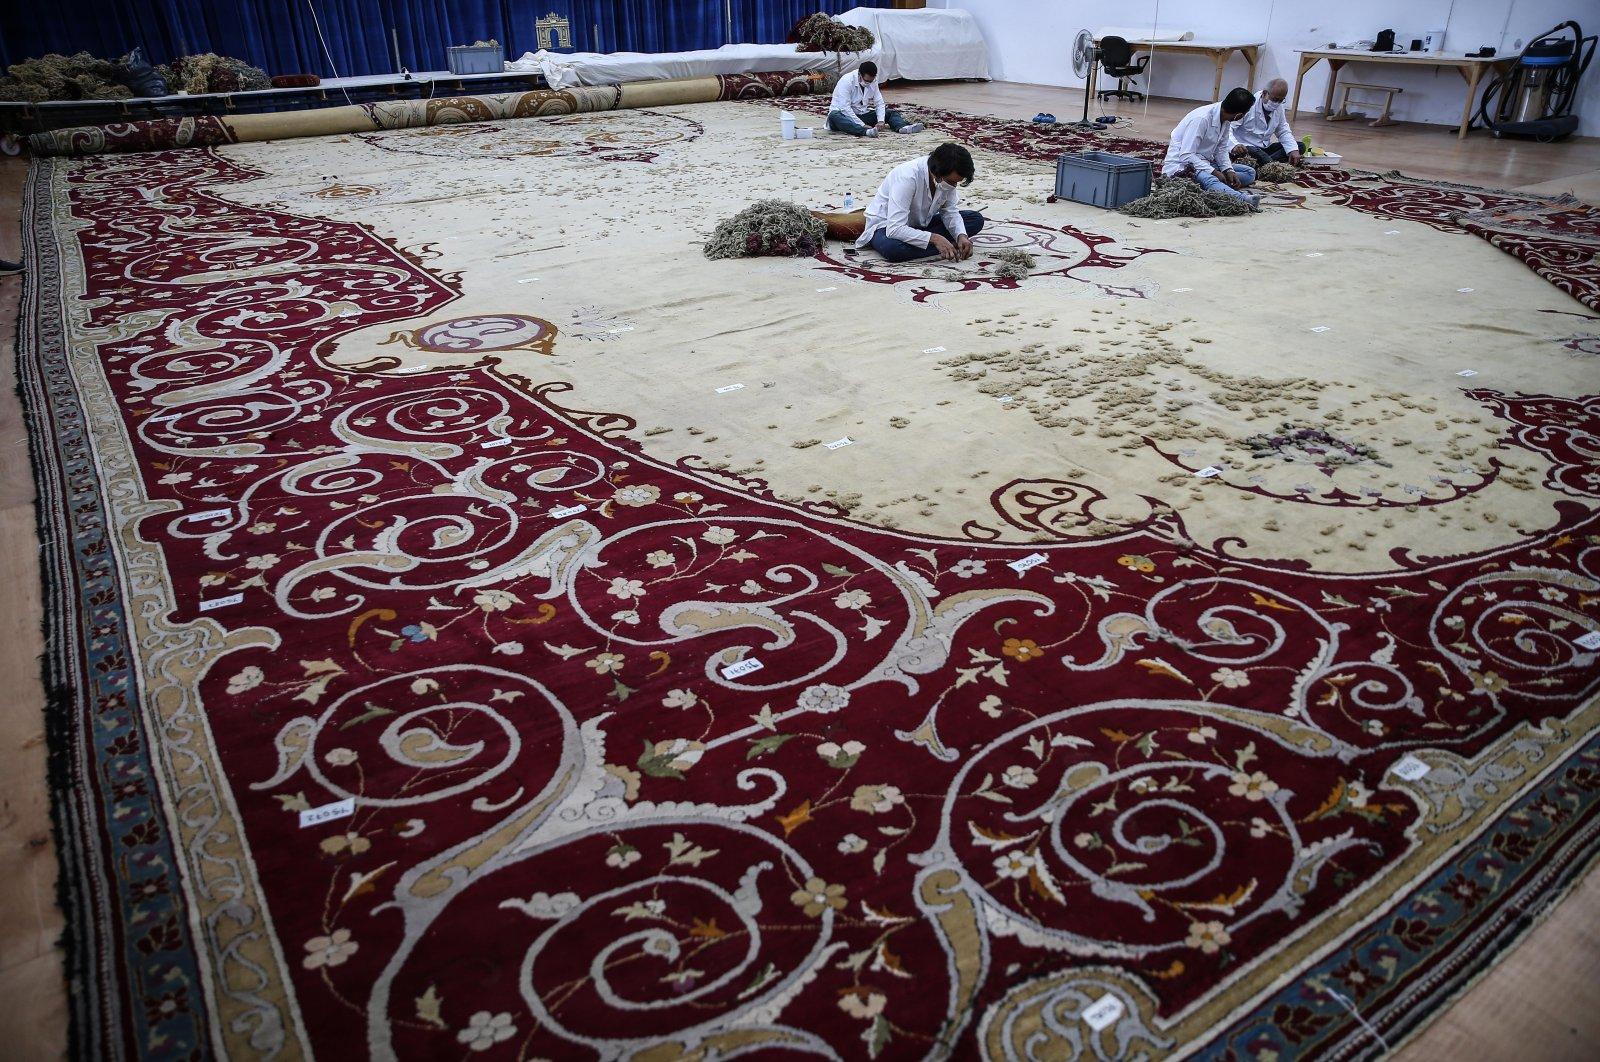 Restoration experts work on the carpet, Istanbul, Turkey, Aug. 19, 2020. (AA Photo)